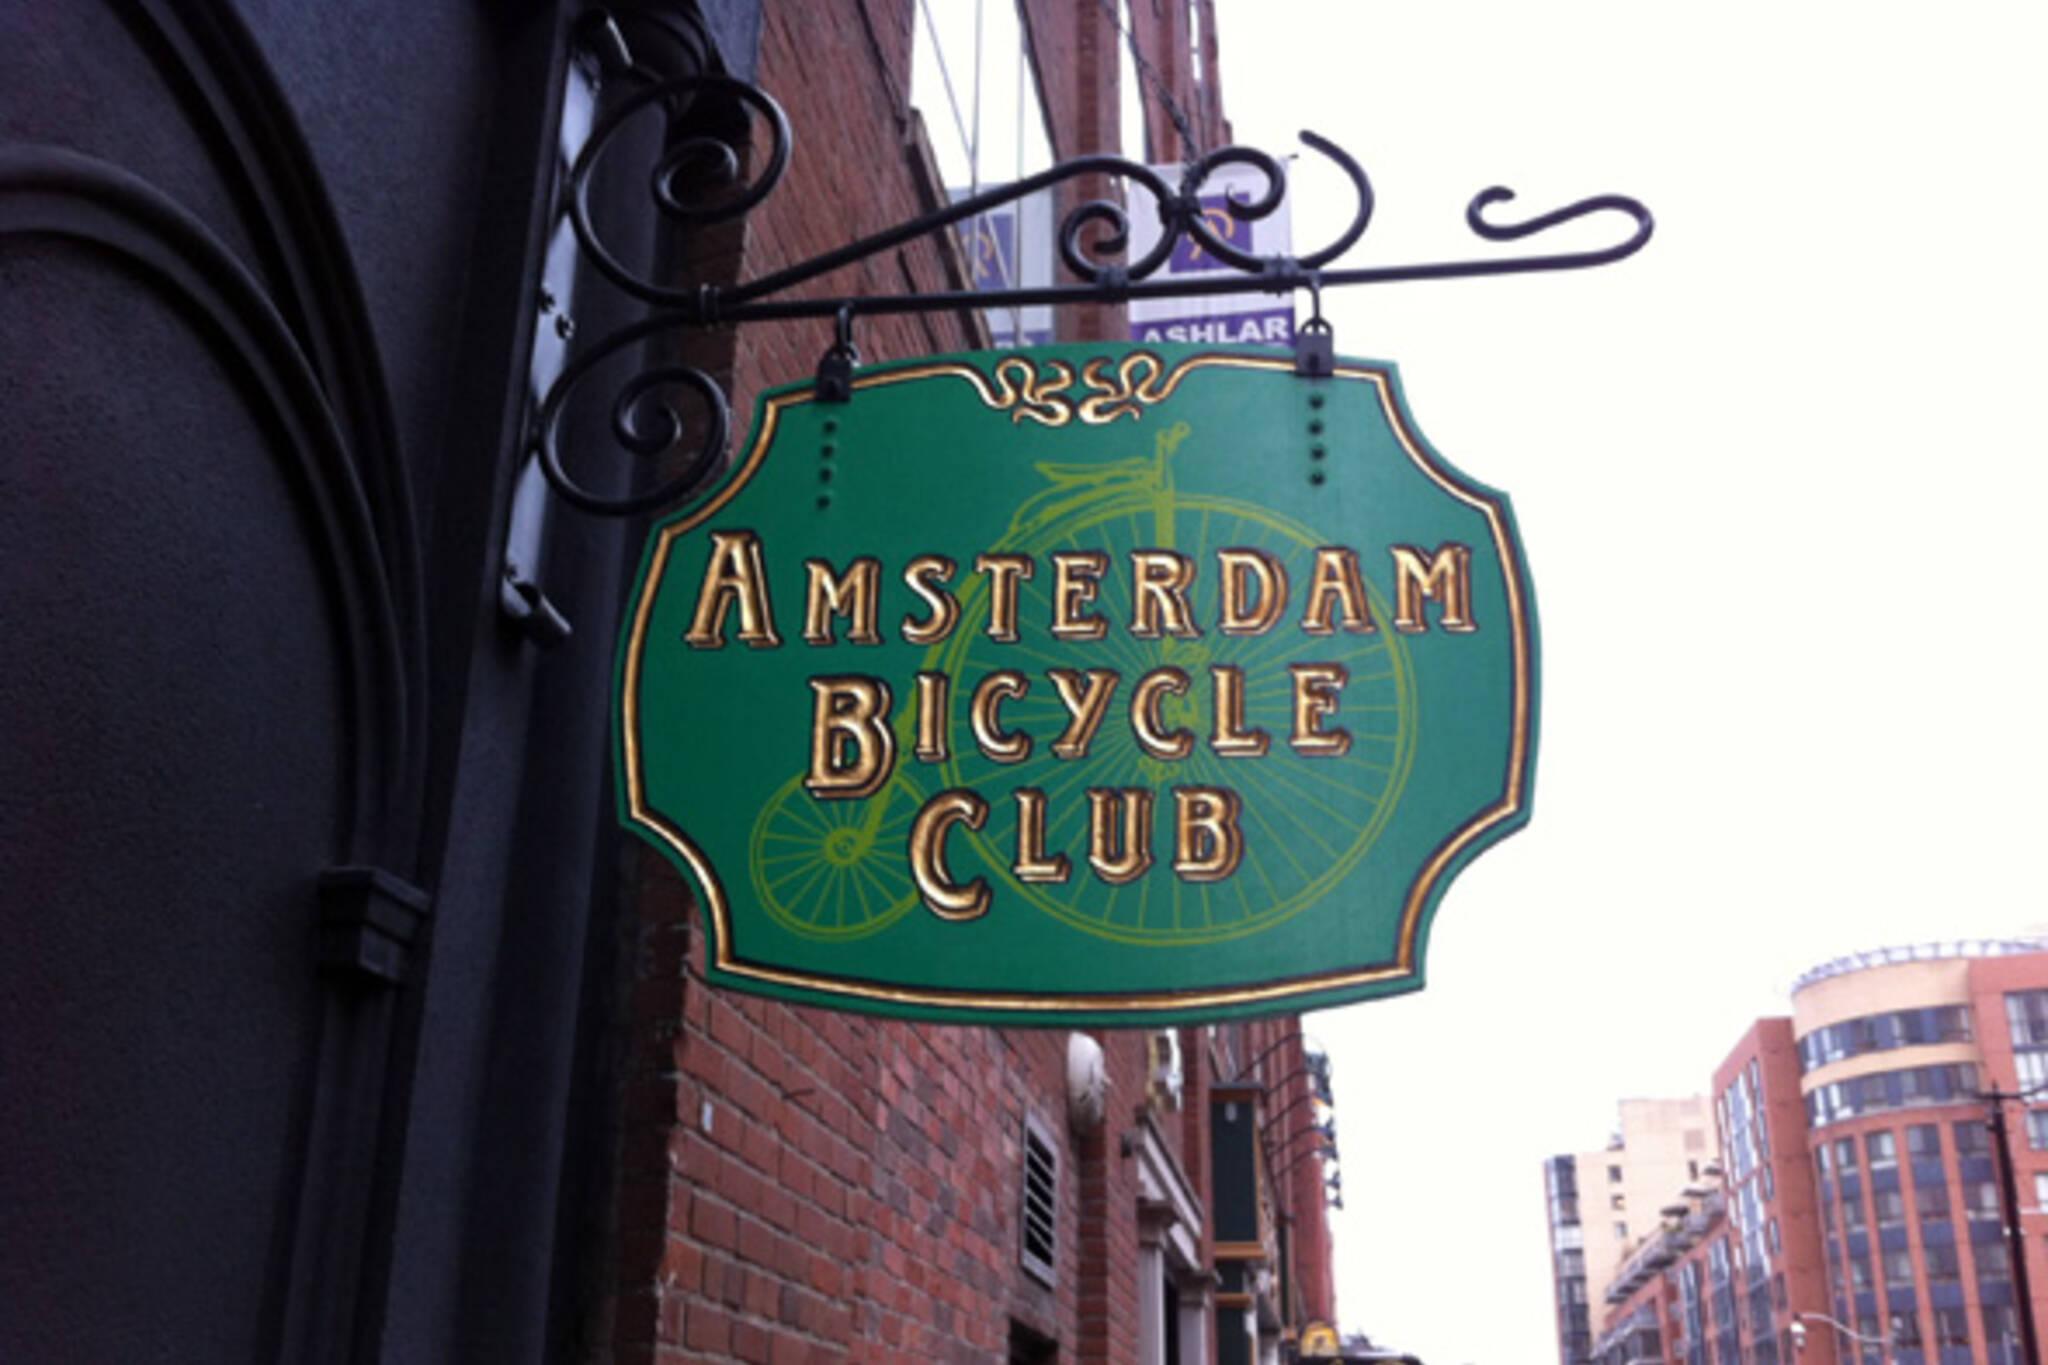 Amsterdam Bicycle Club